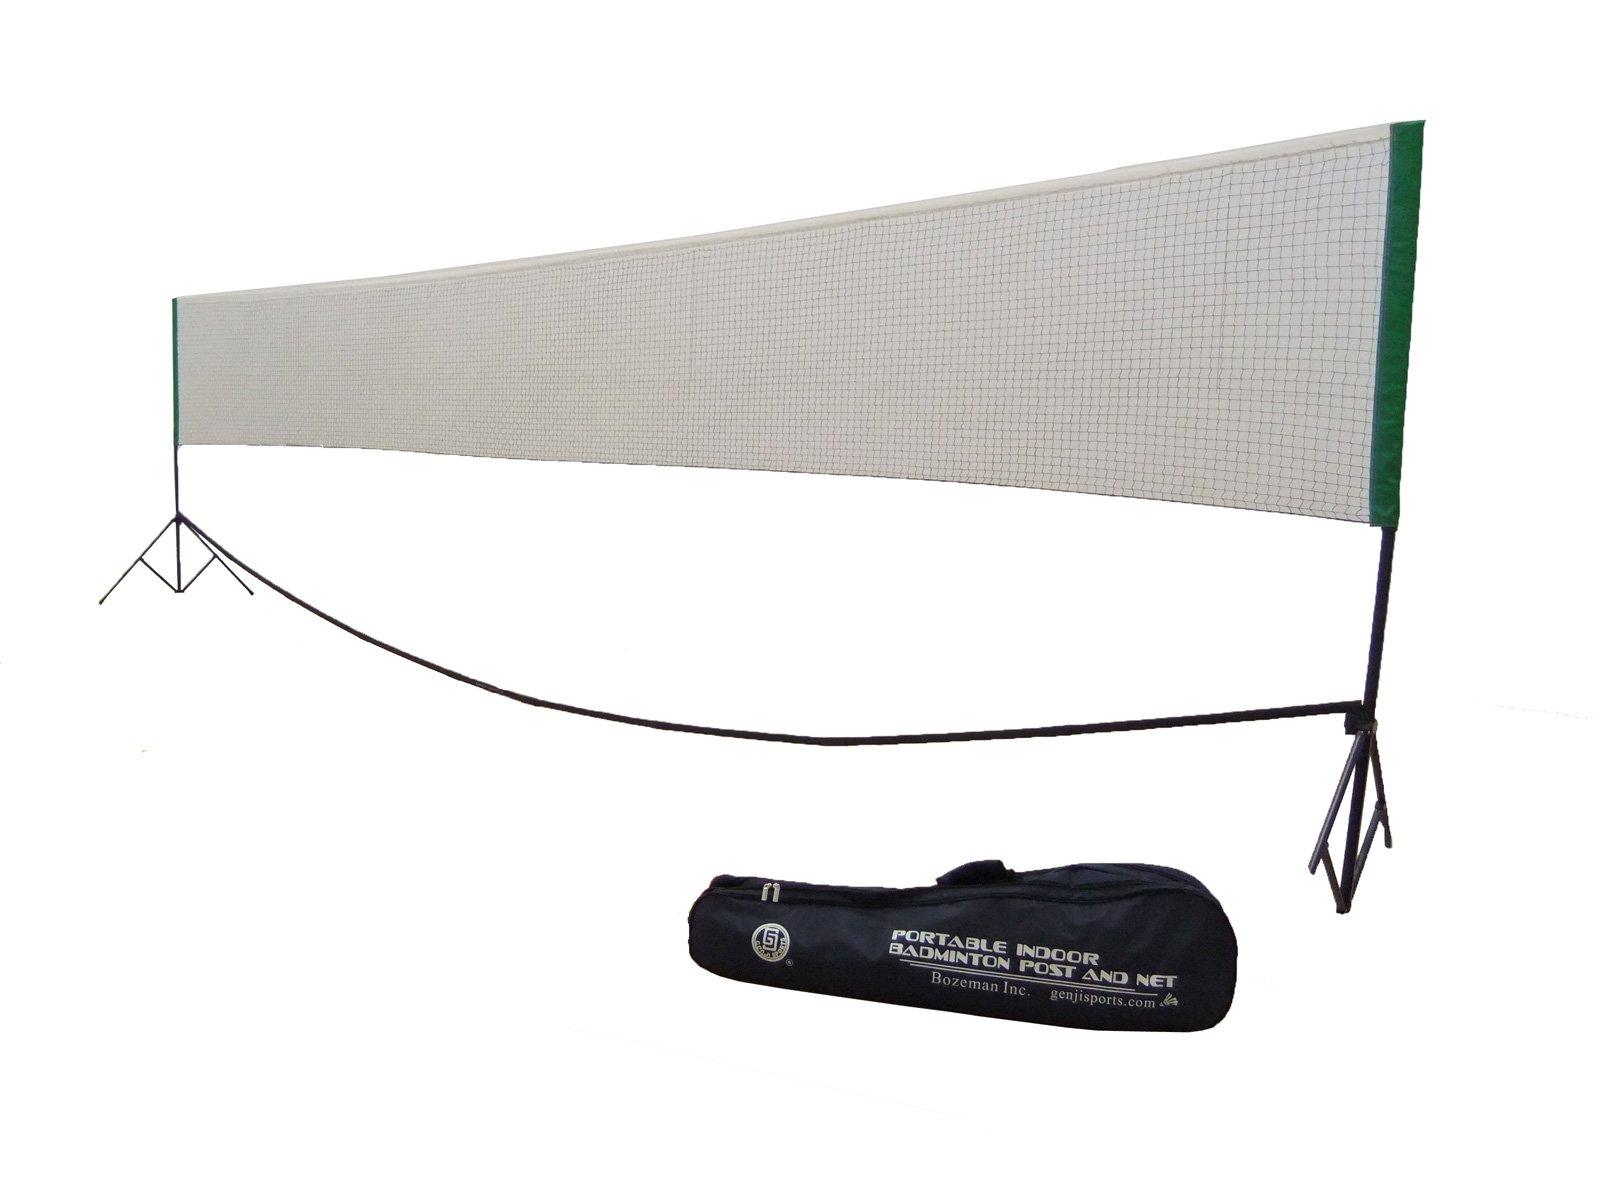 Genji Sports Portable Indoor Badminton, Outdoor Post and Net Set by Genji Sports